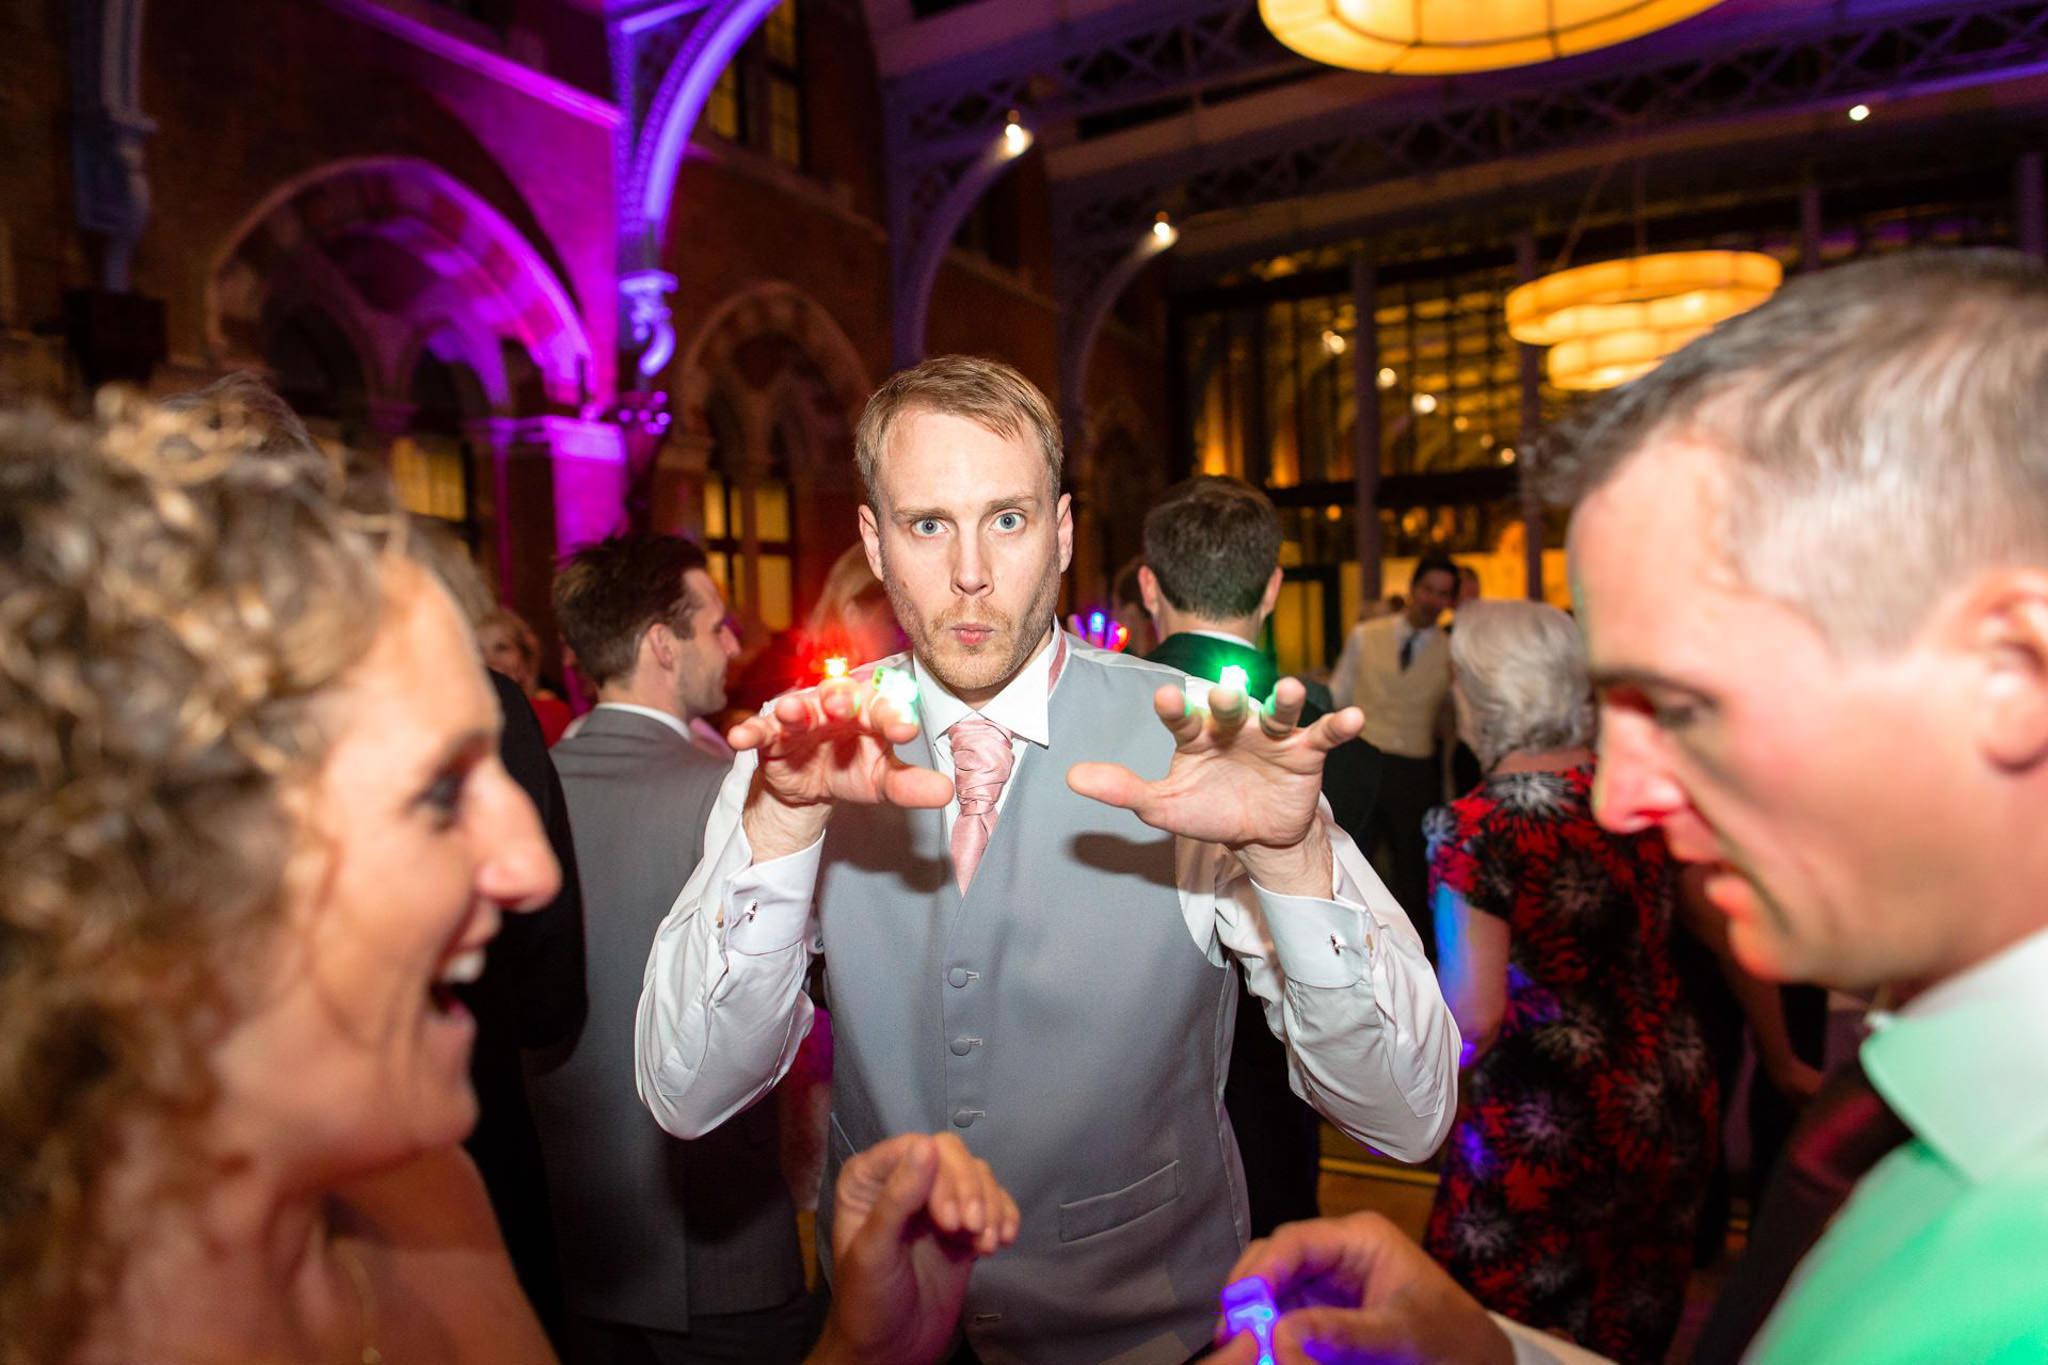 St. Pancras hotel wedding party